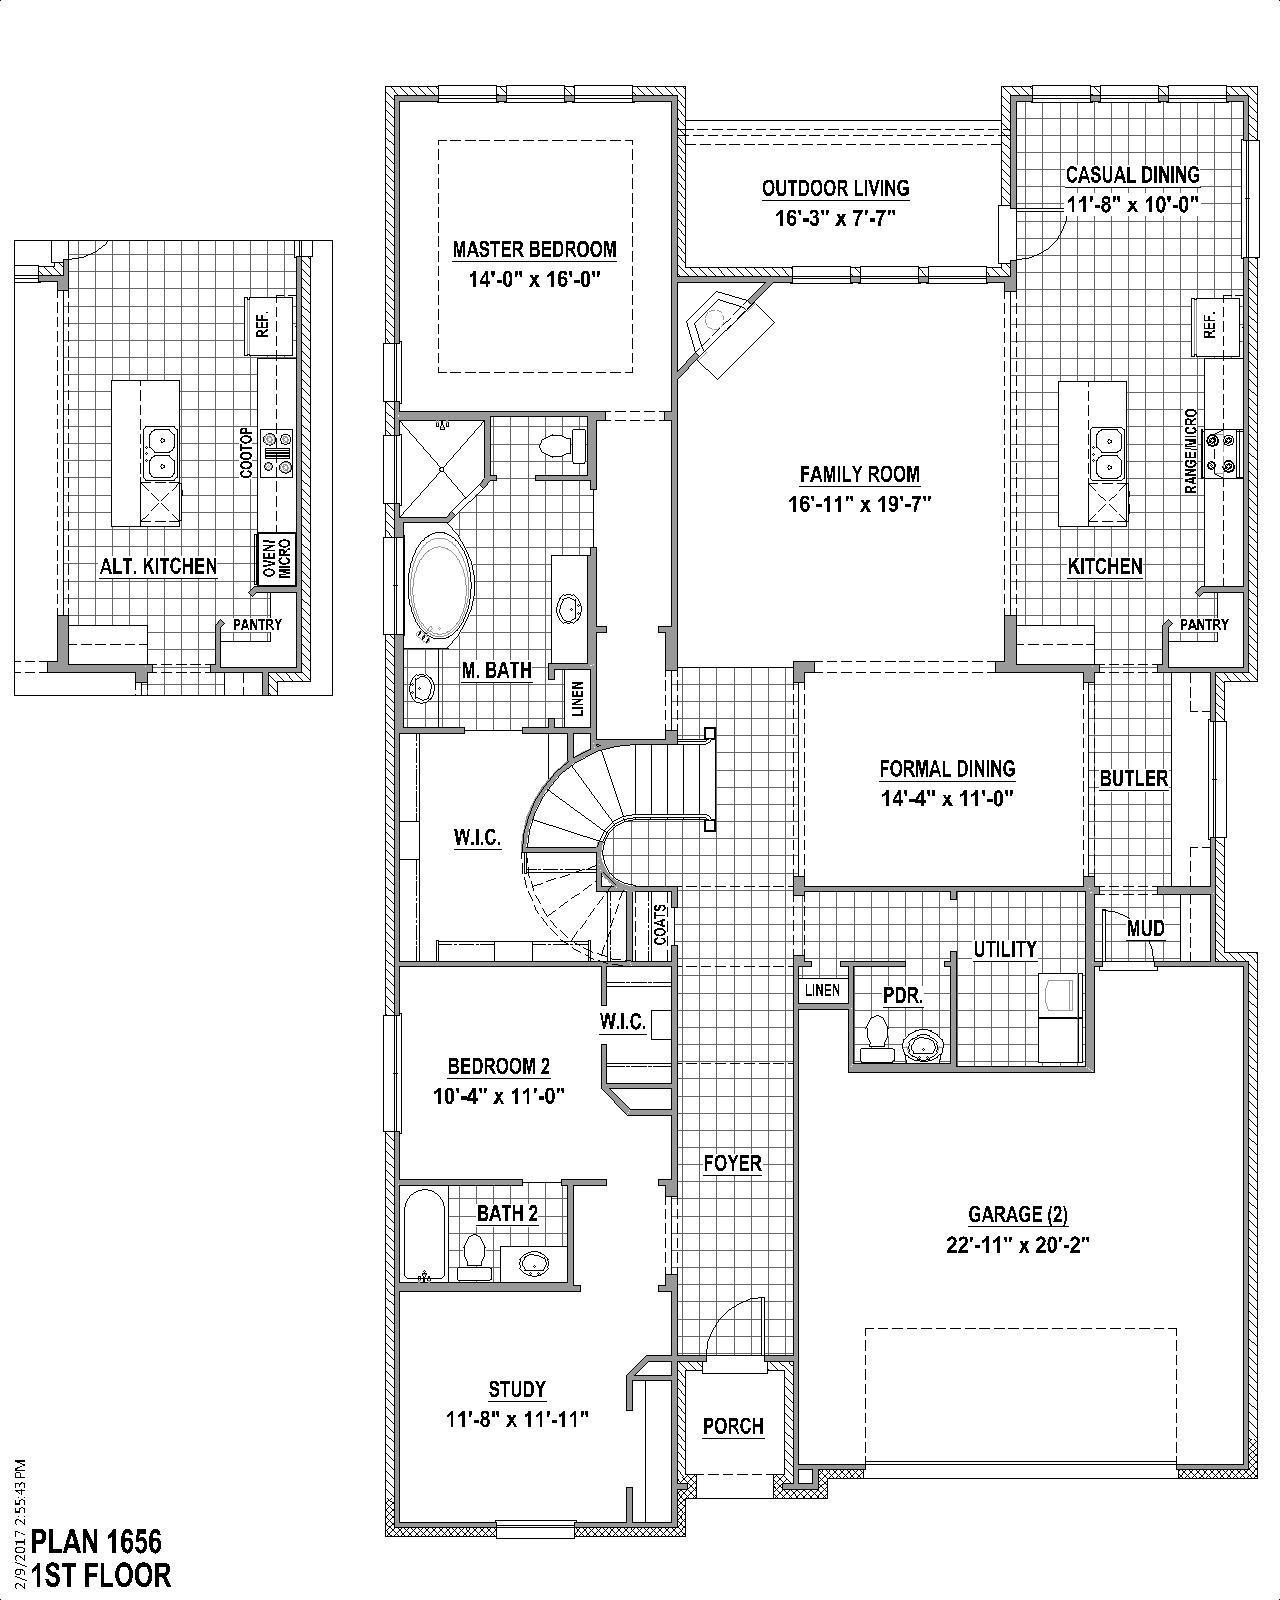 Plan 1656 Floor Plan